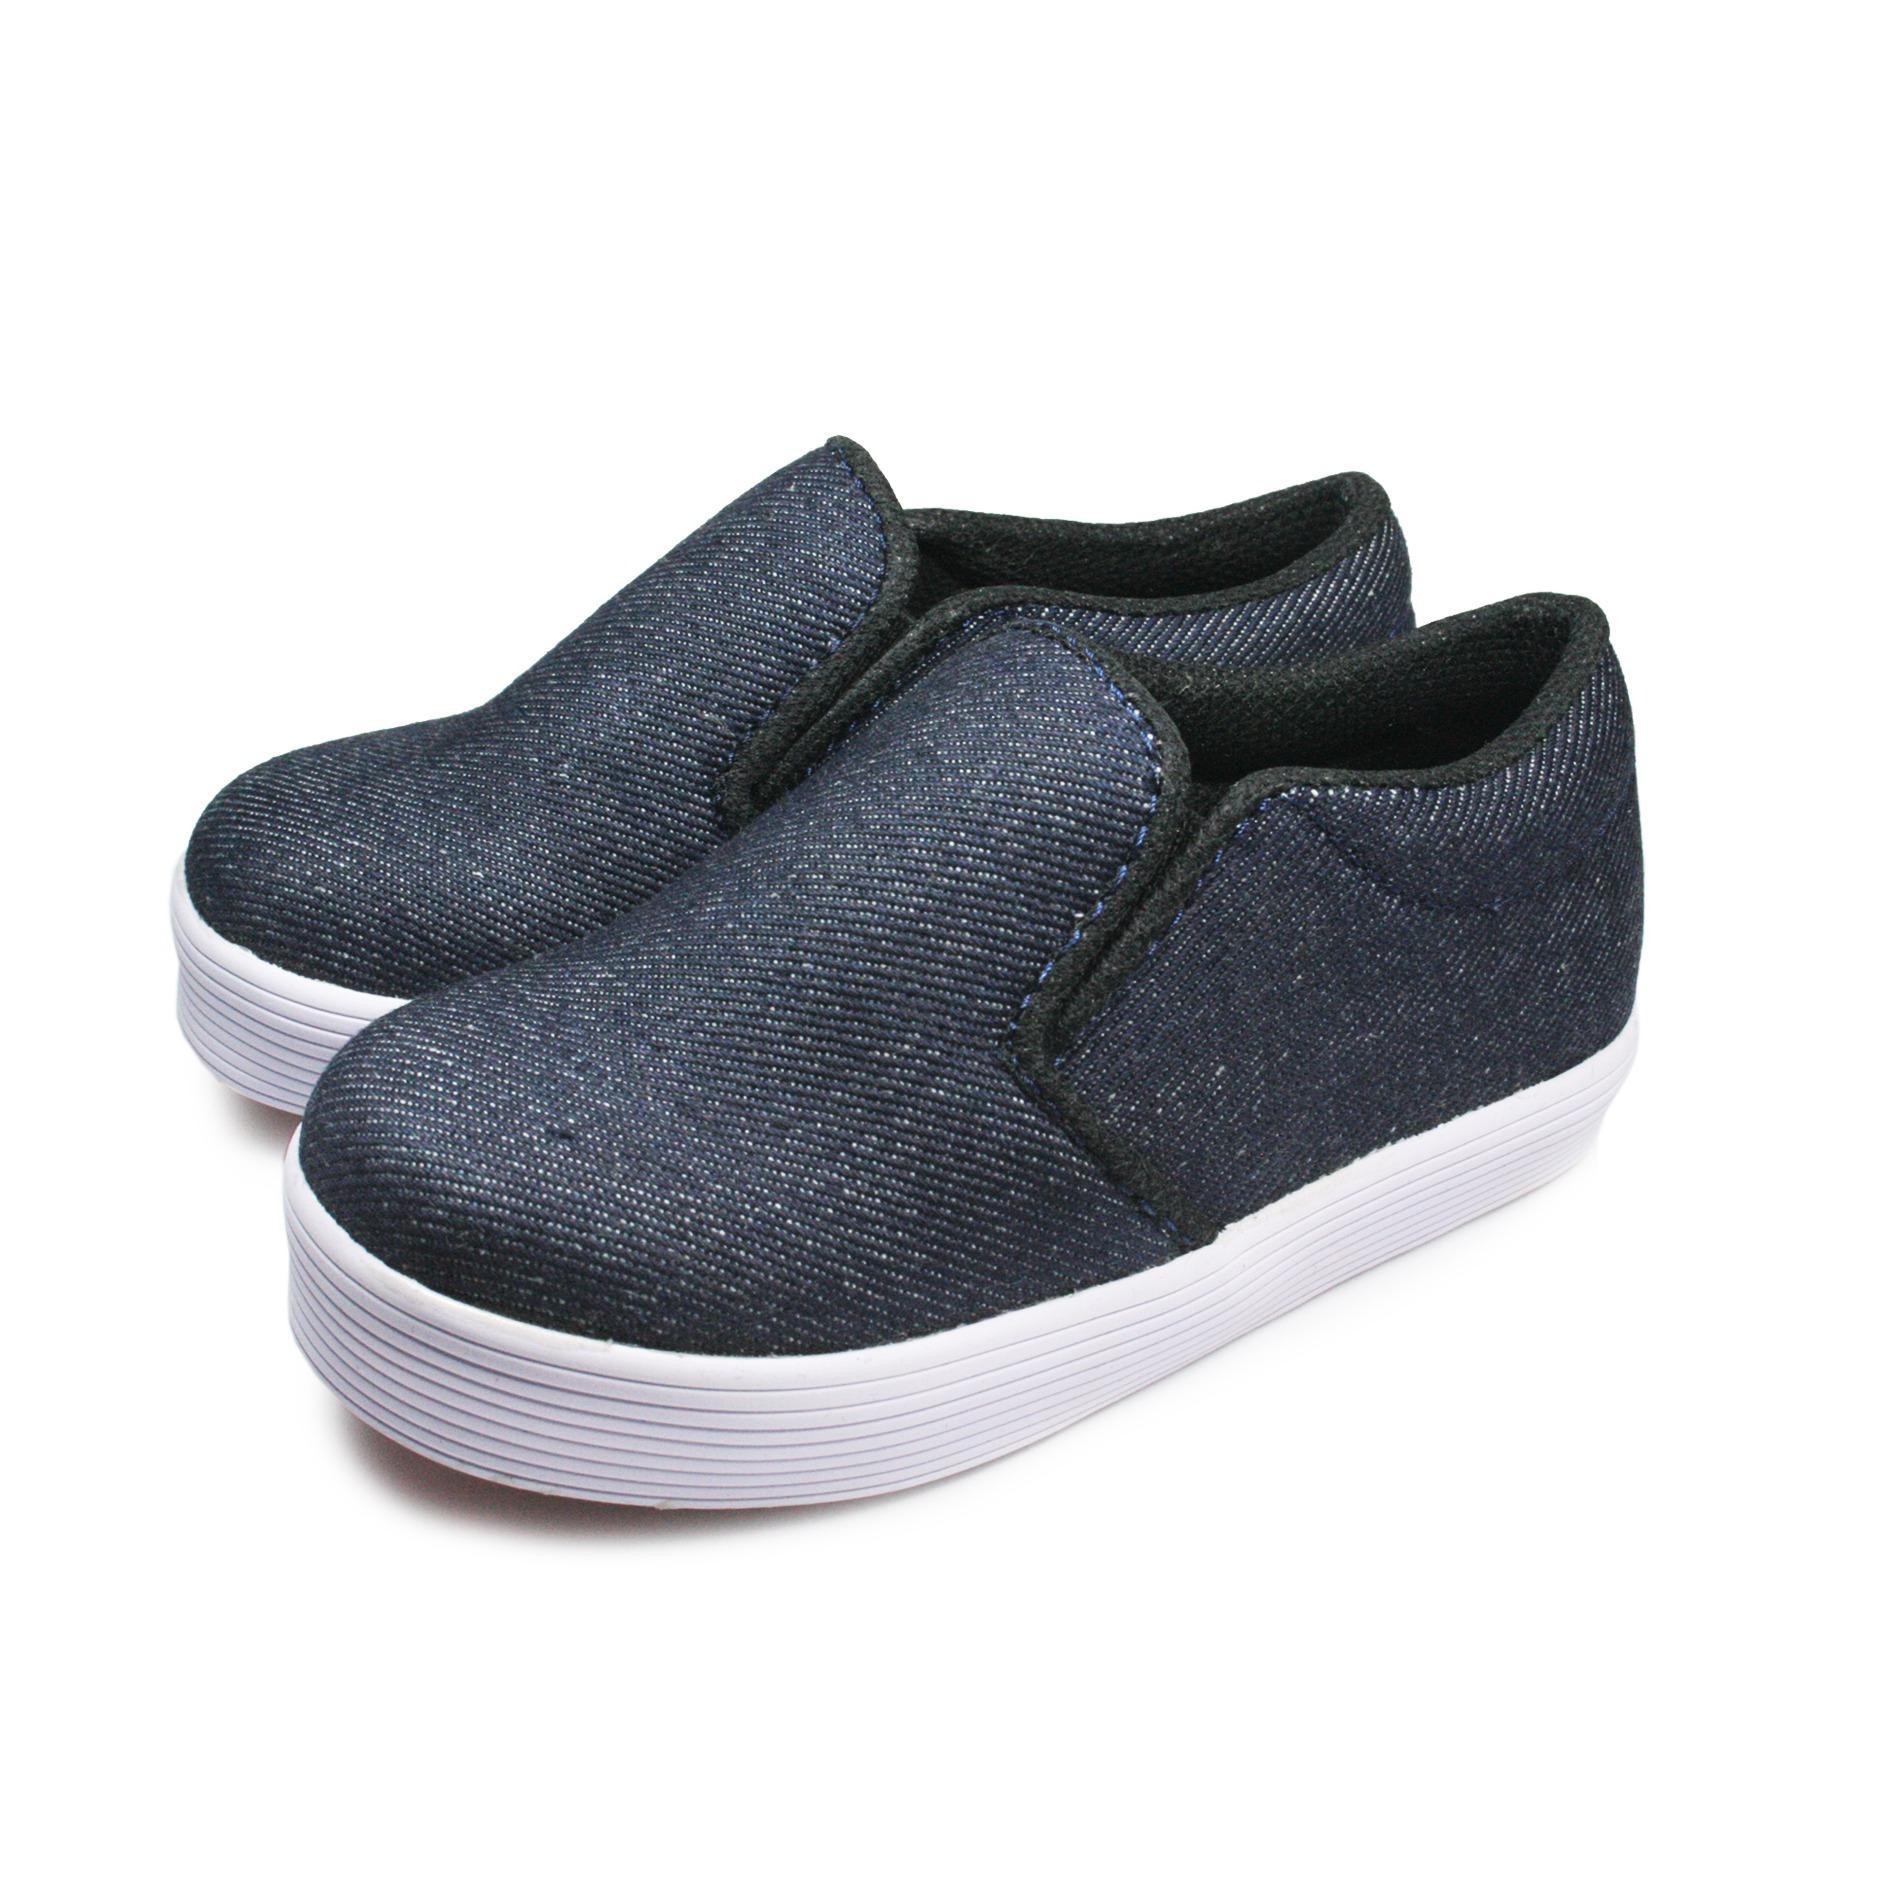 Tamagoo Sepatu Anak Laki-Laki/Kids Shoes/slip On - Noel Denim